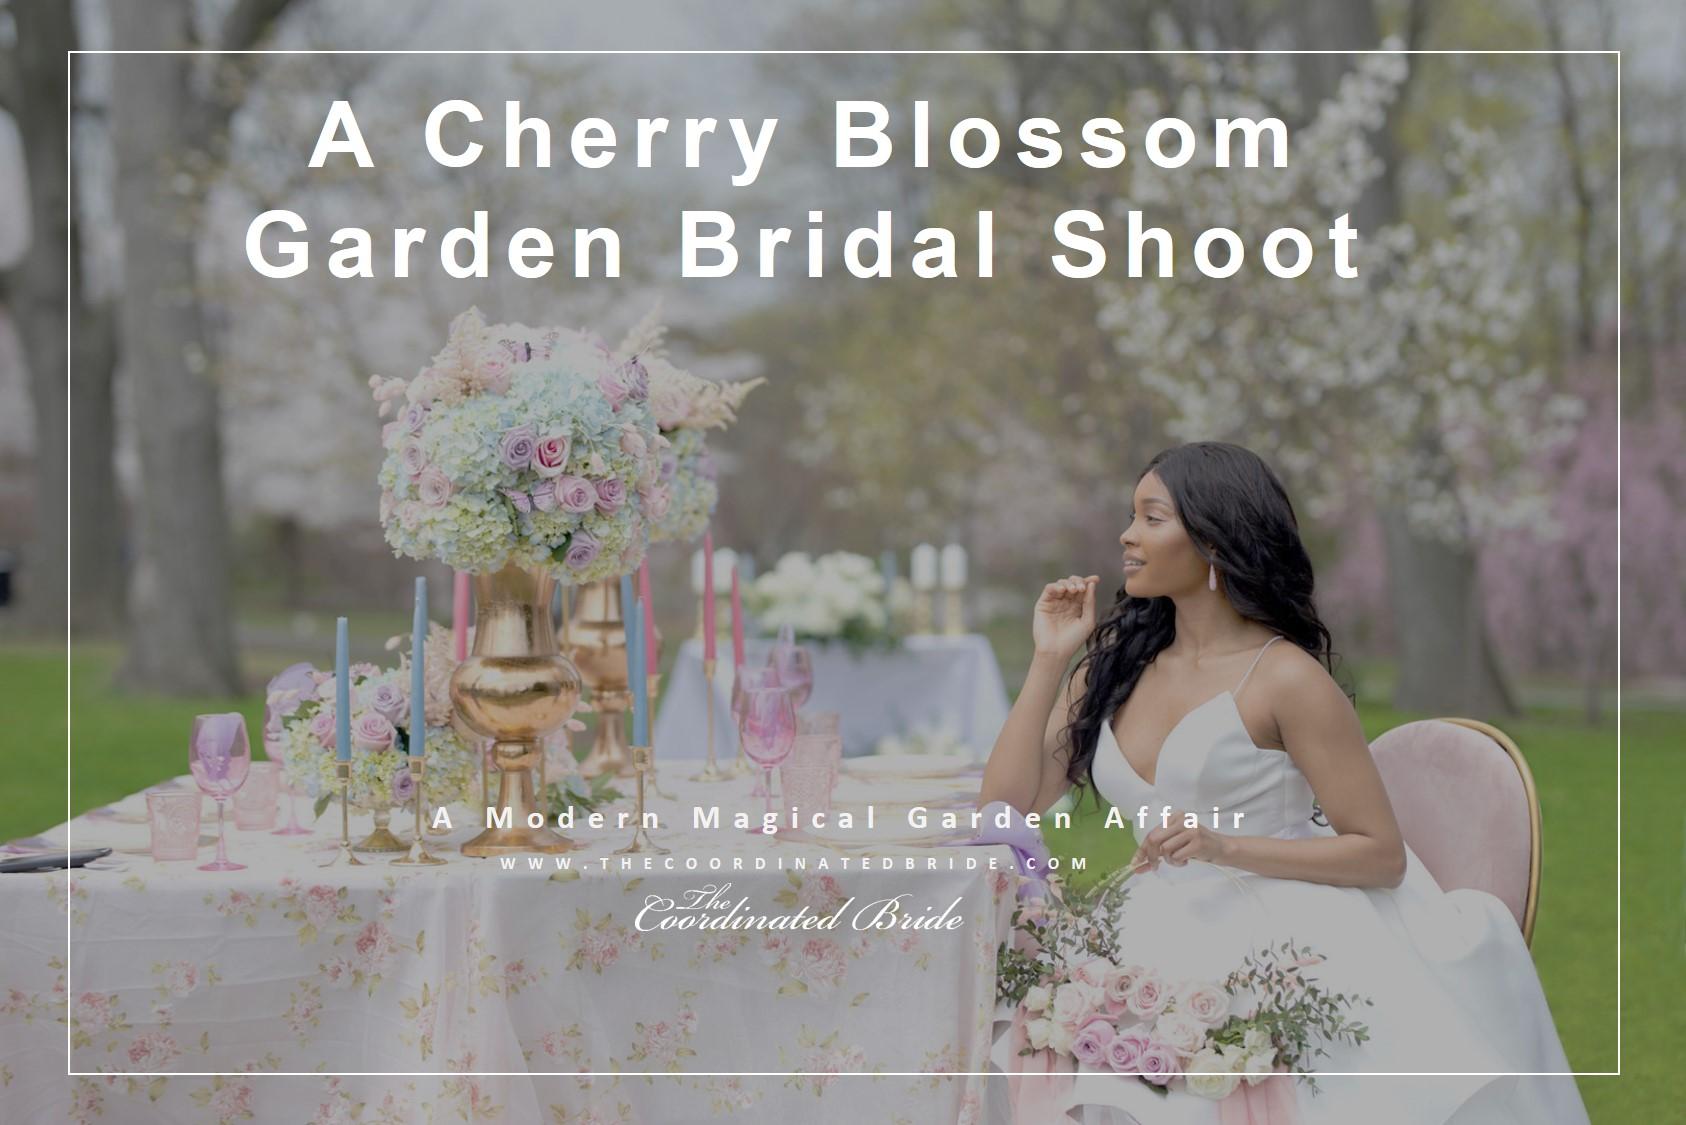 A Cherry Blossom Garden Bridal Shoot